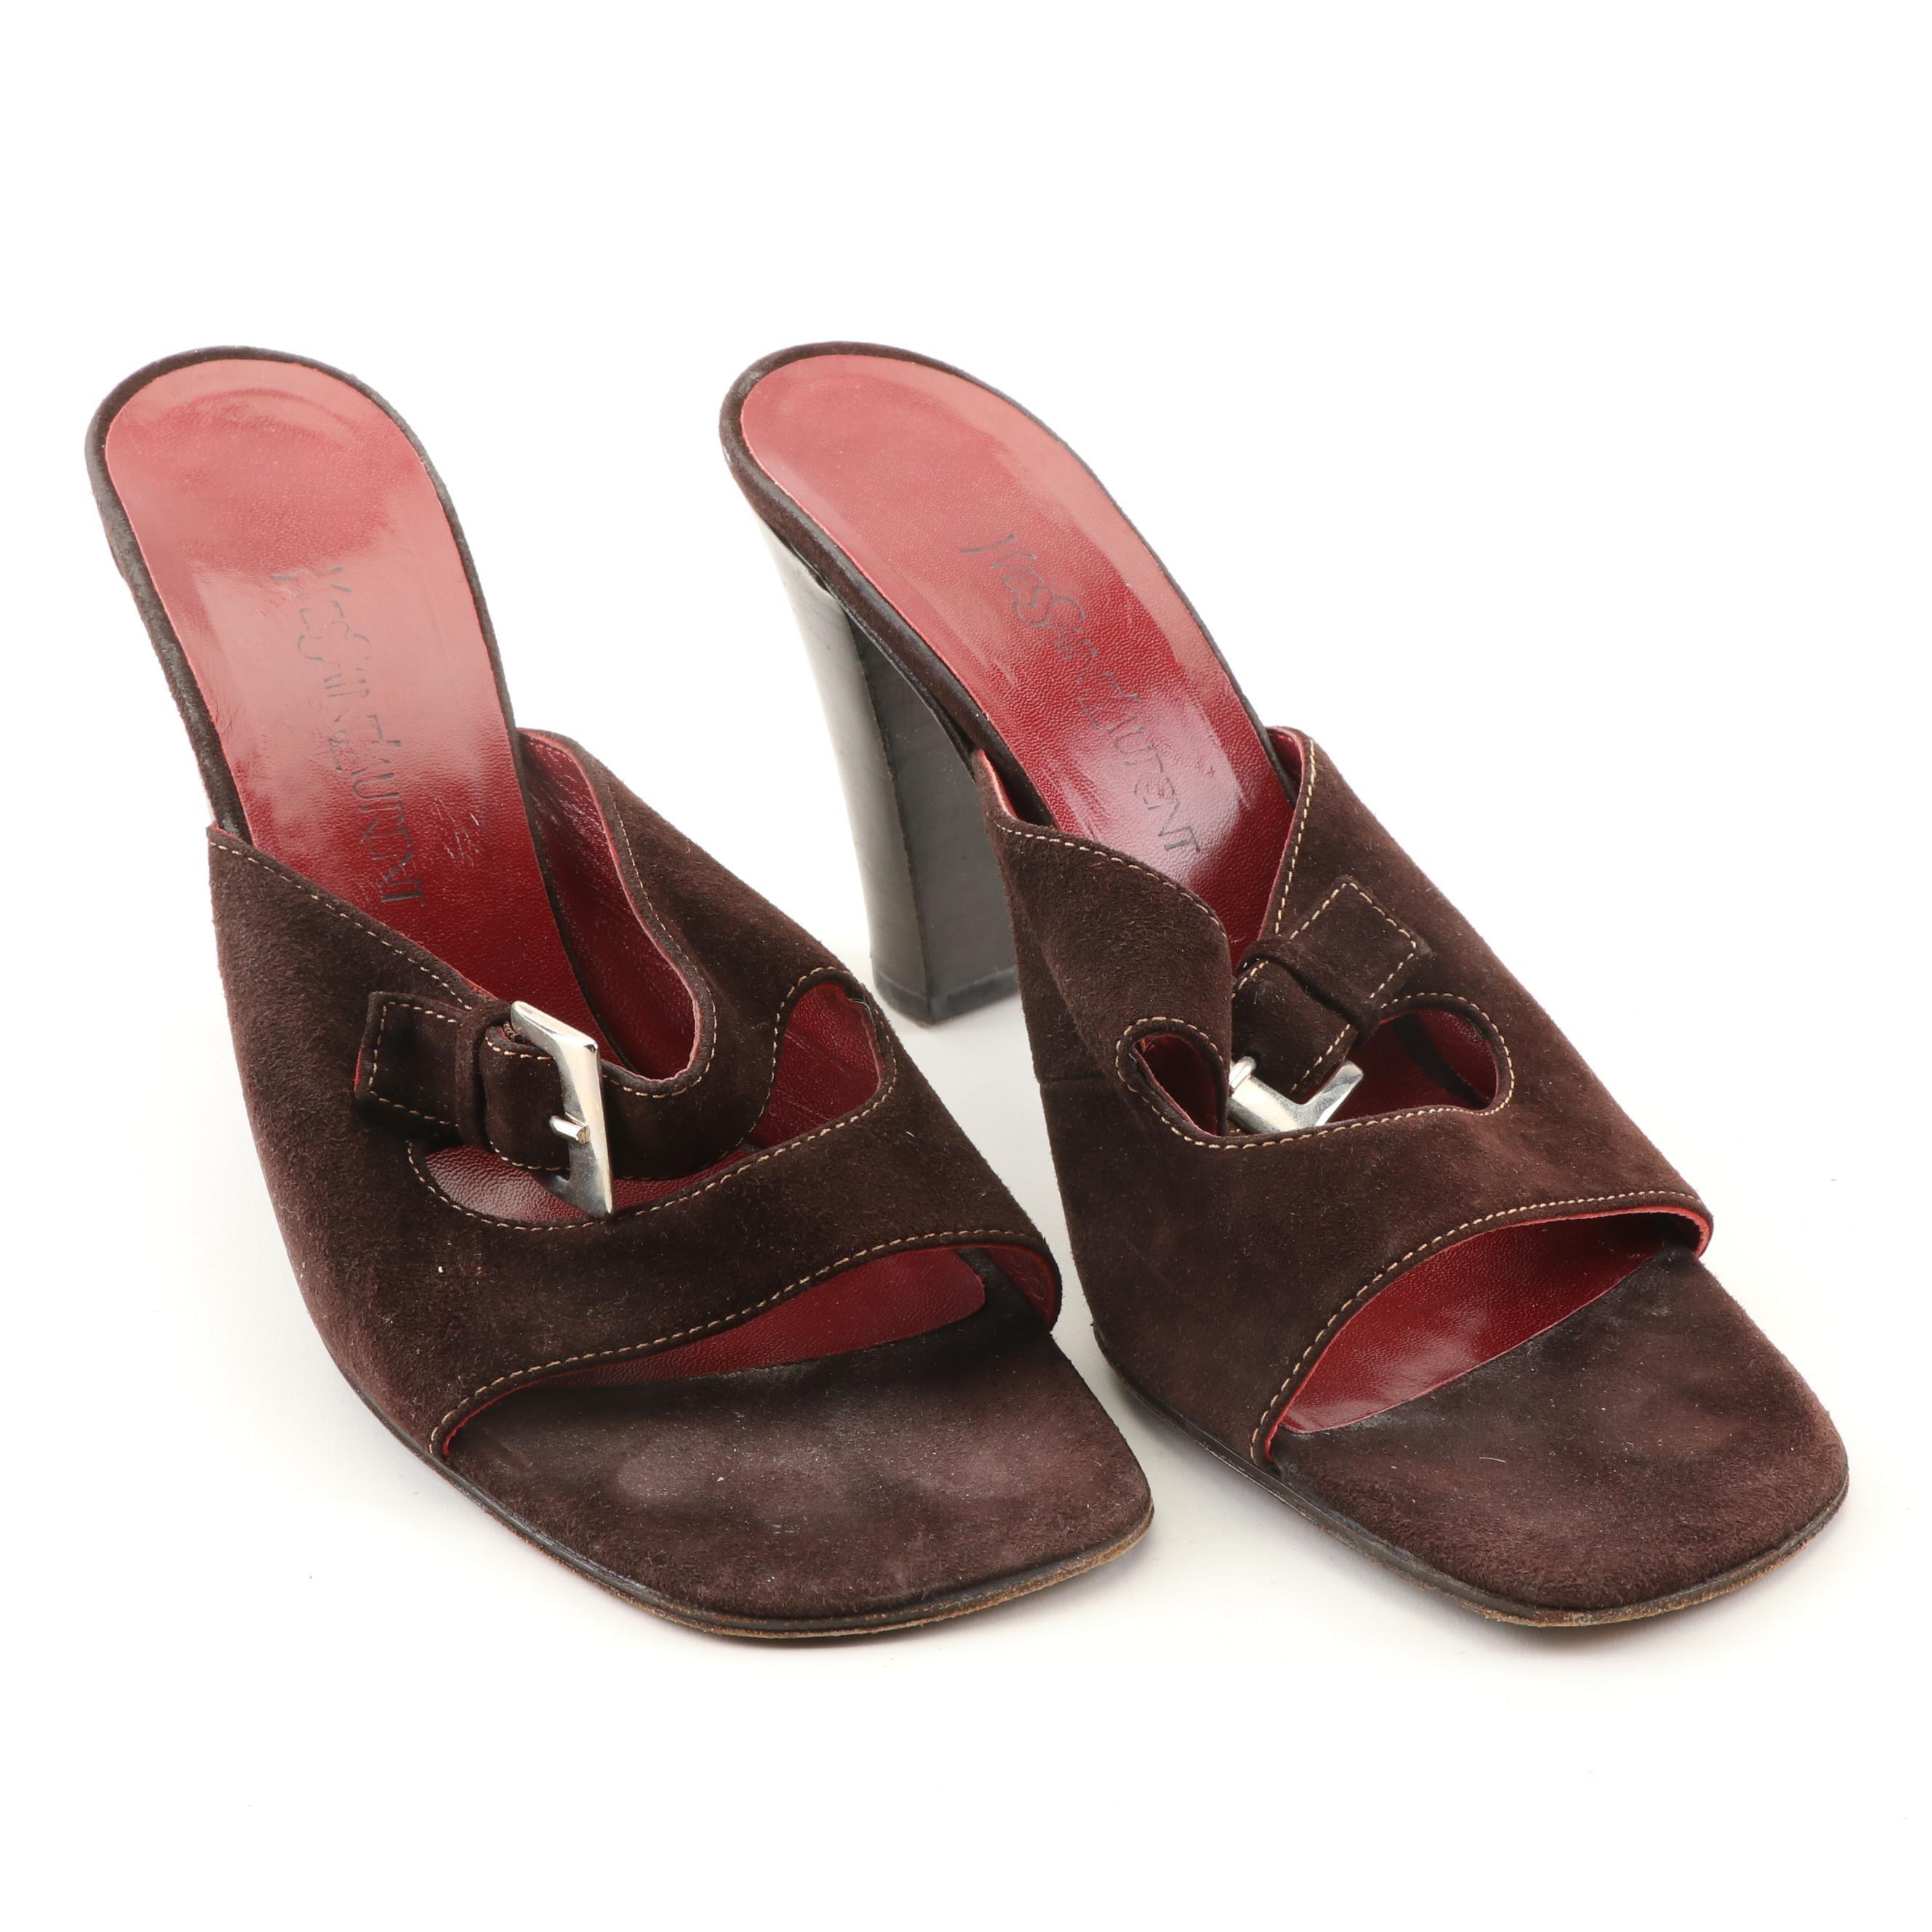 Yves Saint Laurent Suede Slide Sandals